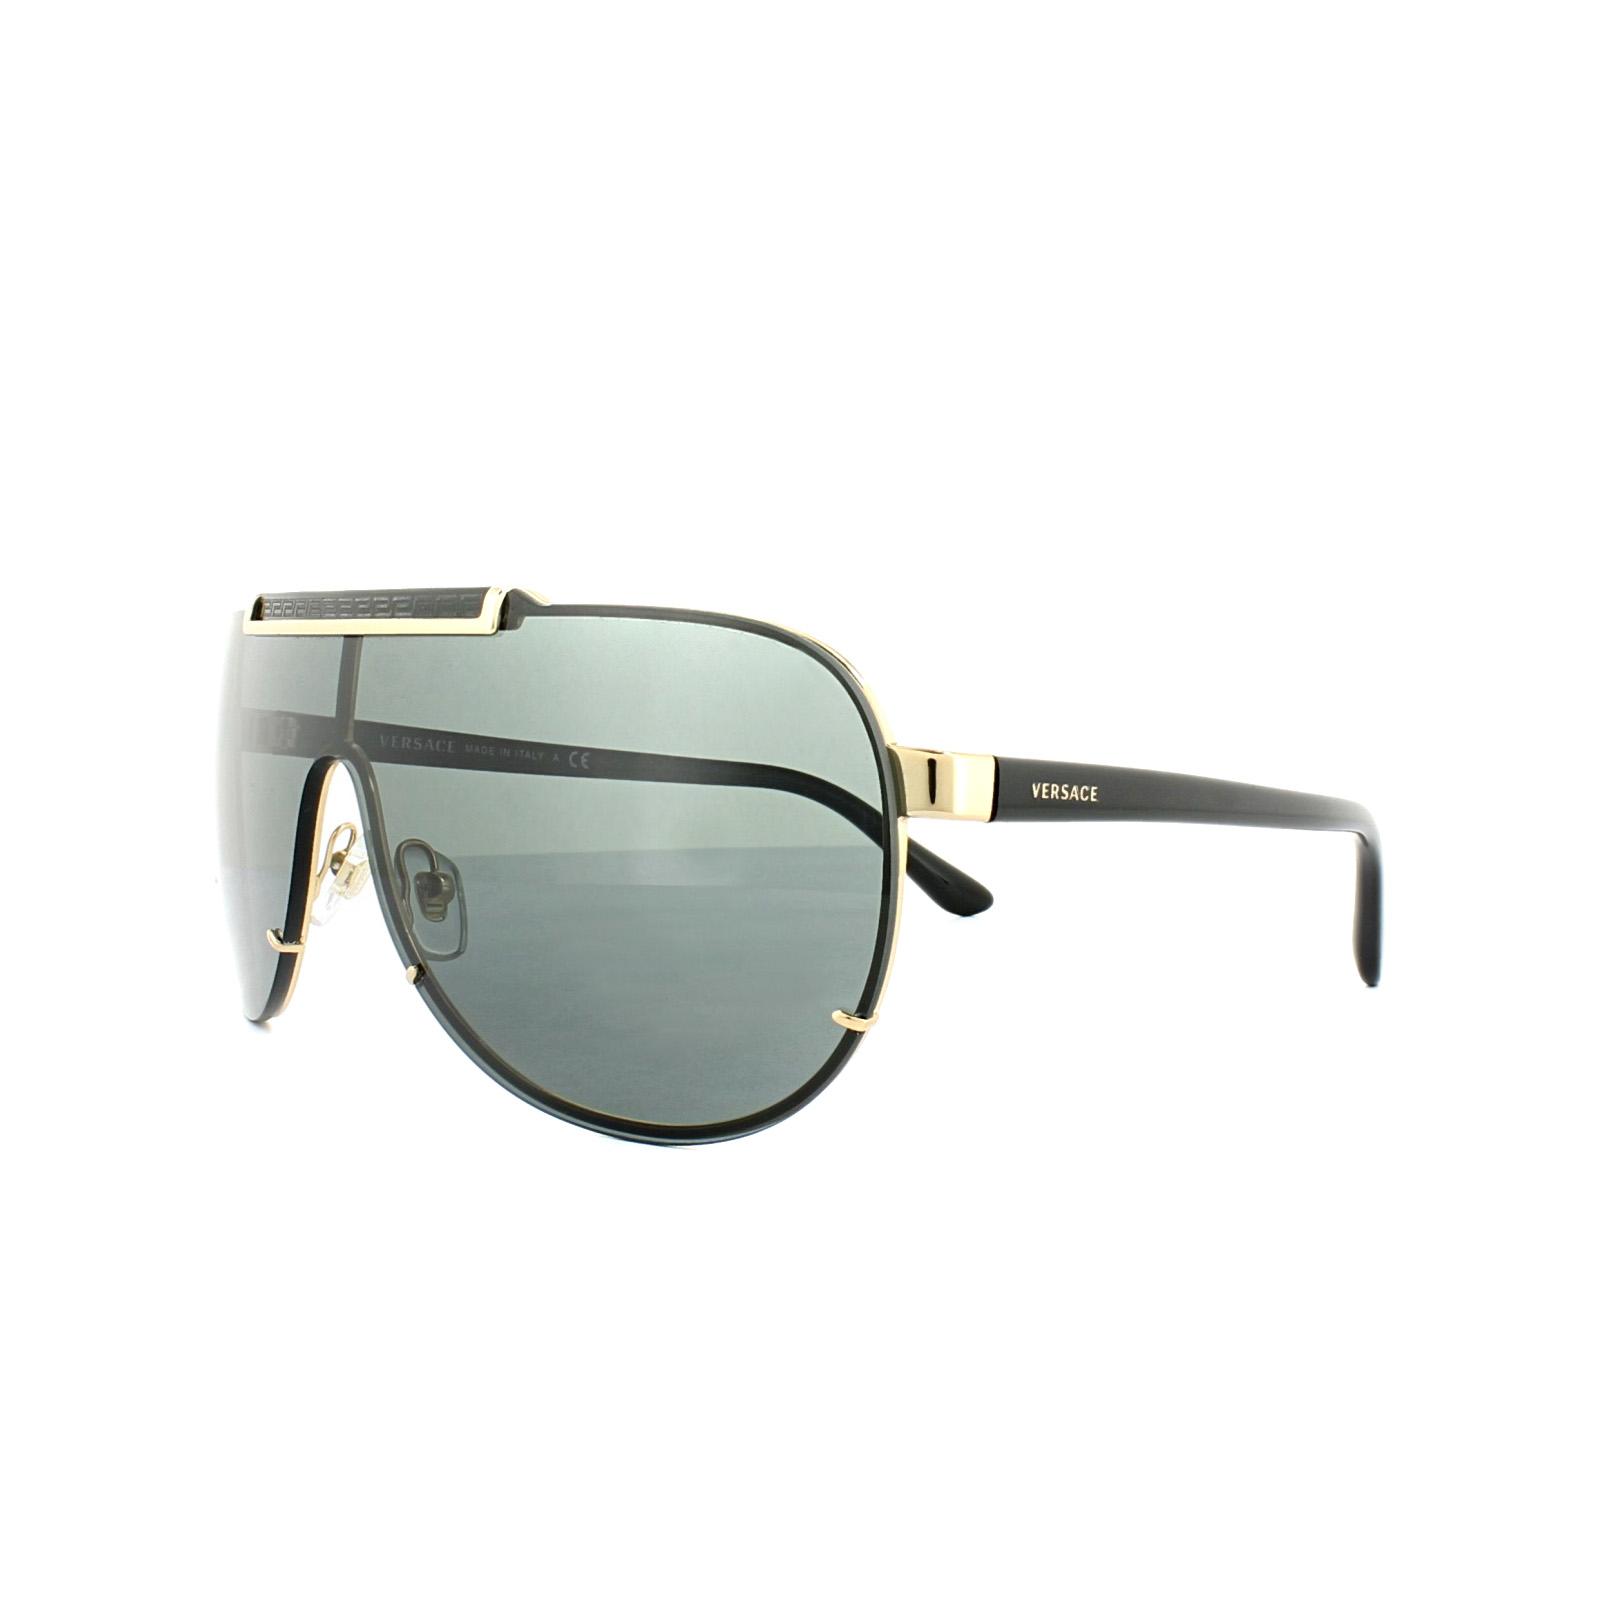 5f5e657b5c Versace Sunglasses 2140 100287 Gold Grey 725125823265